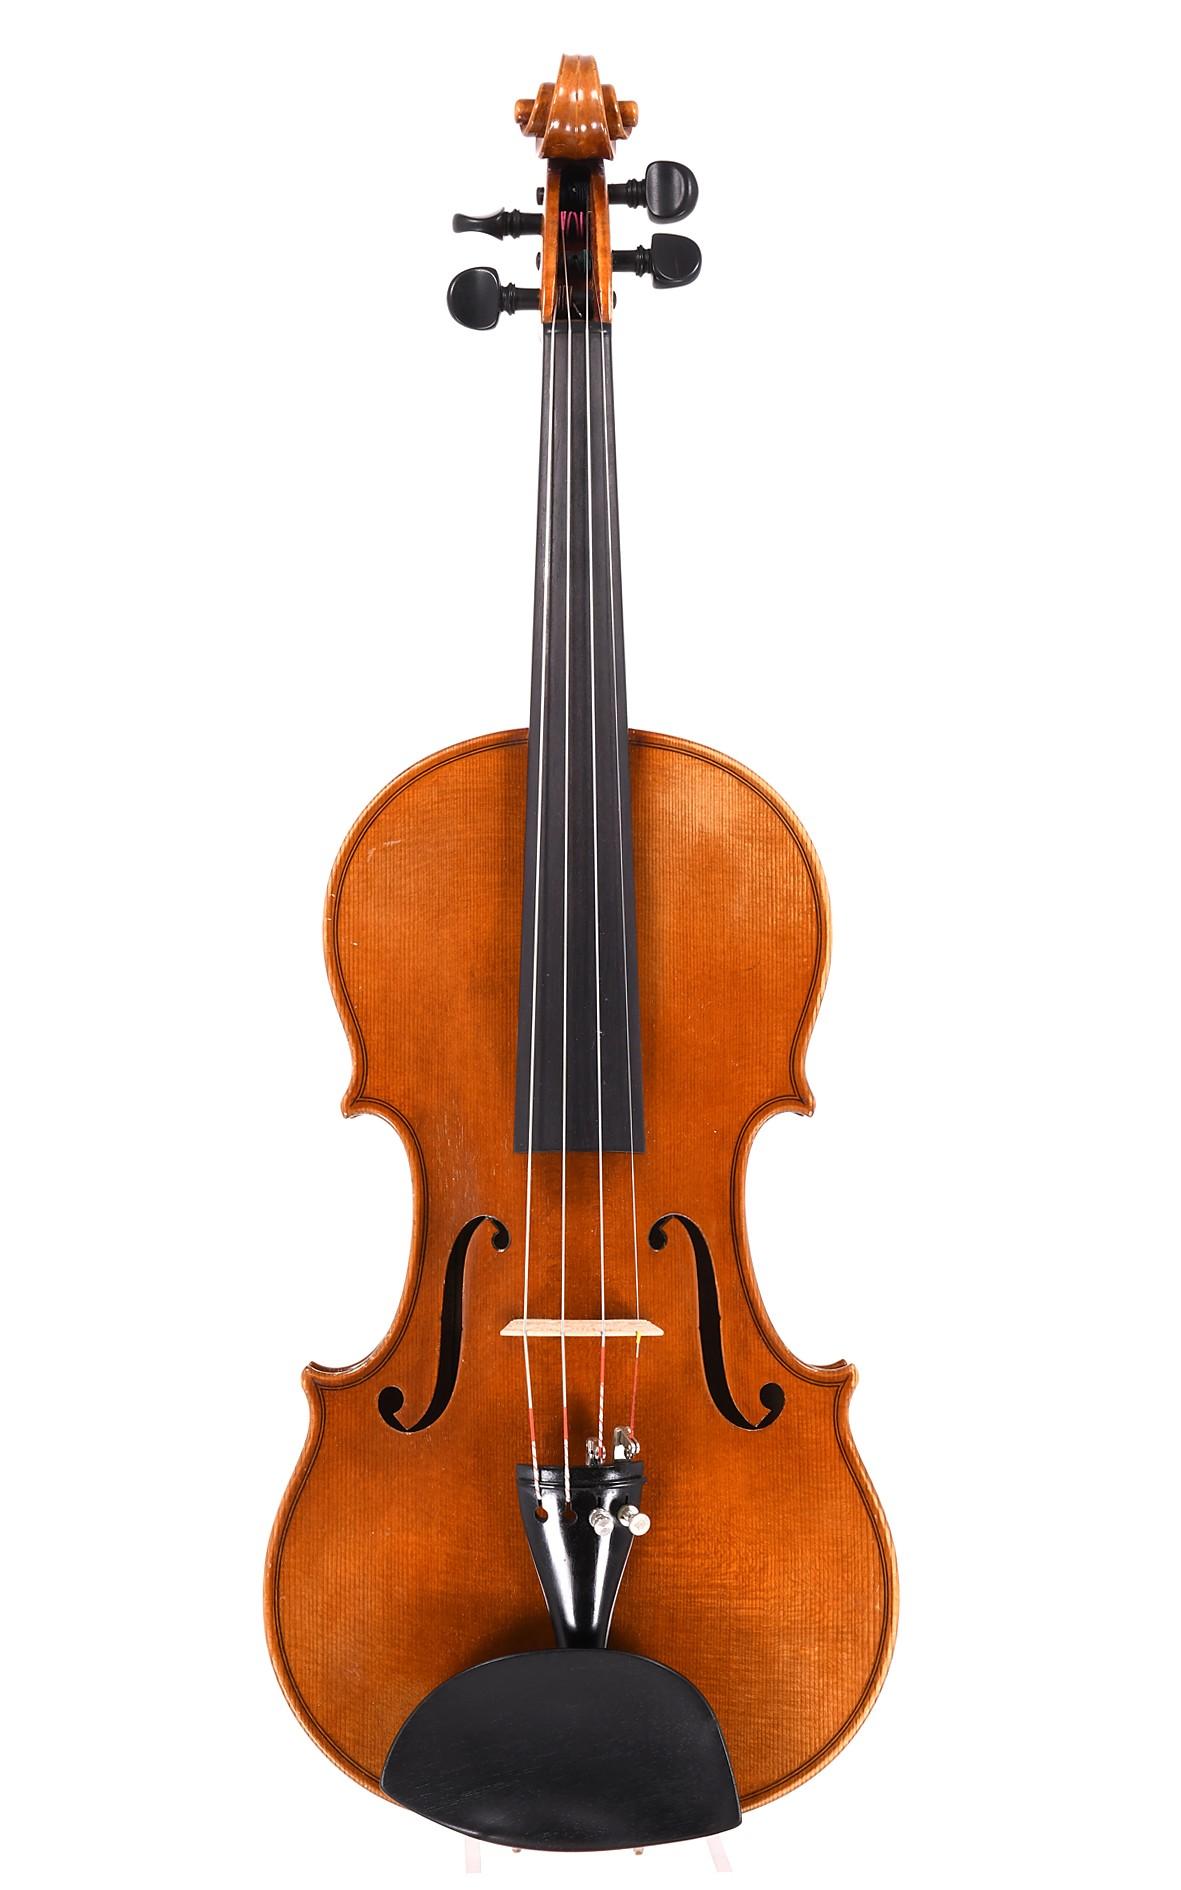 Master violin by Erich Sandner